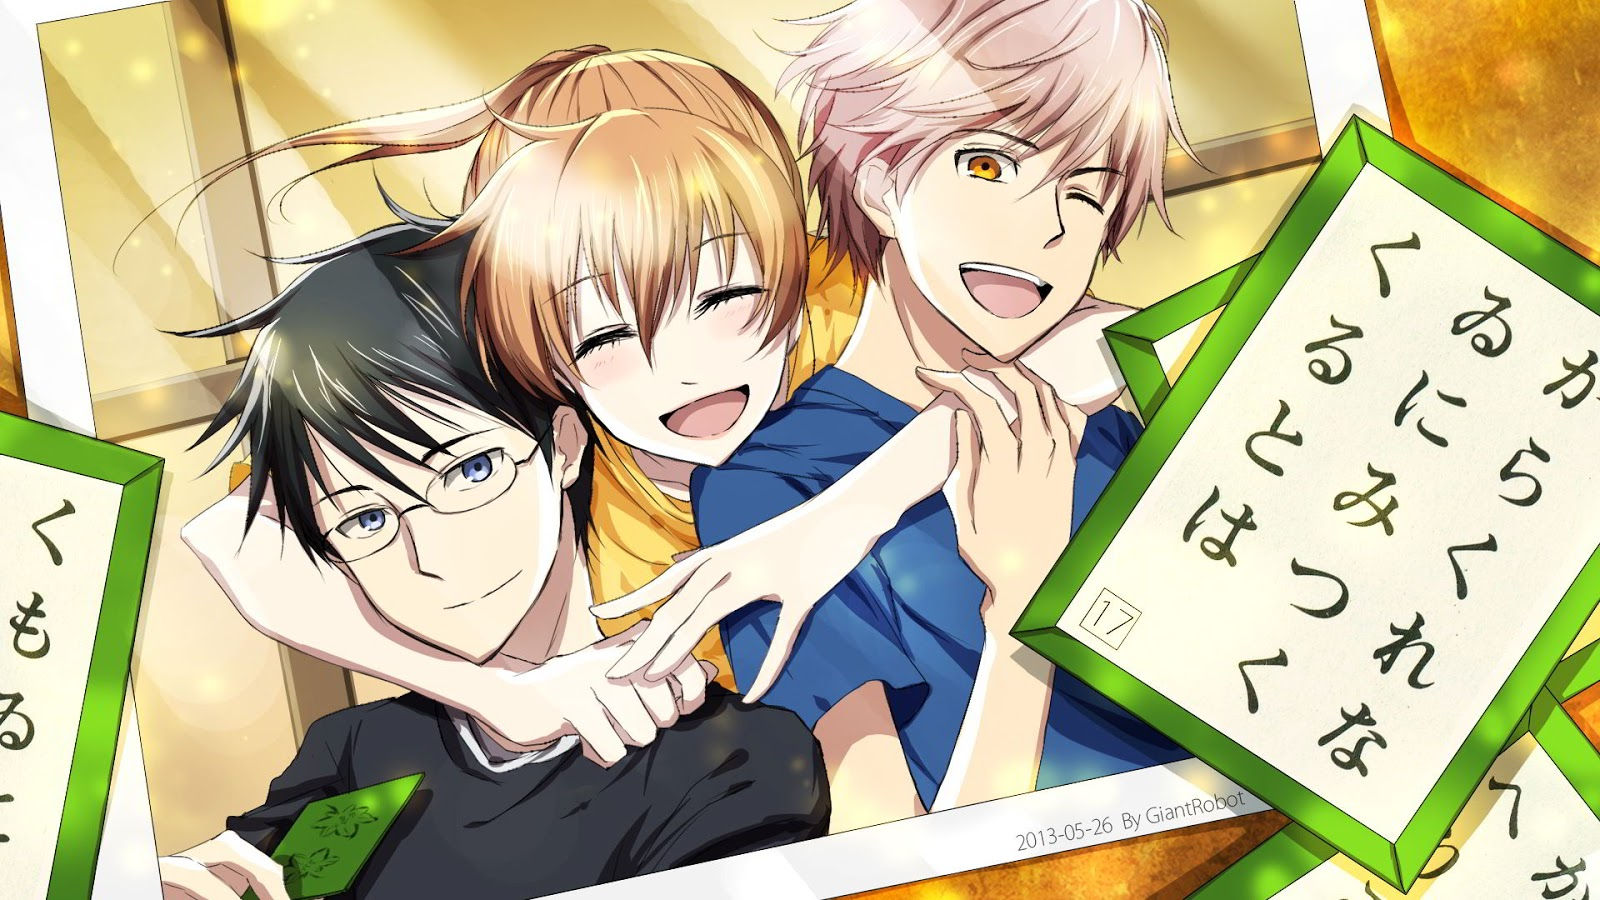 1 - Chihayafuru S2 Subtitle Indonesia Batch Episode 1-25 + OVA BD